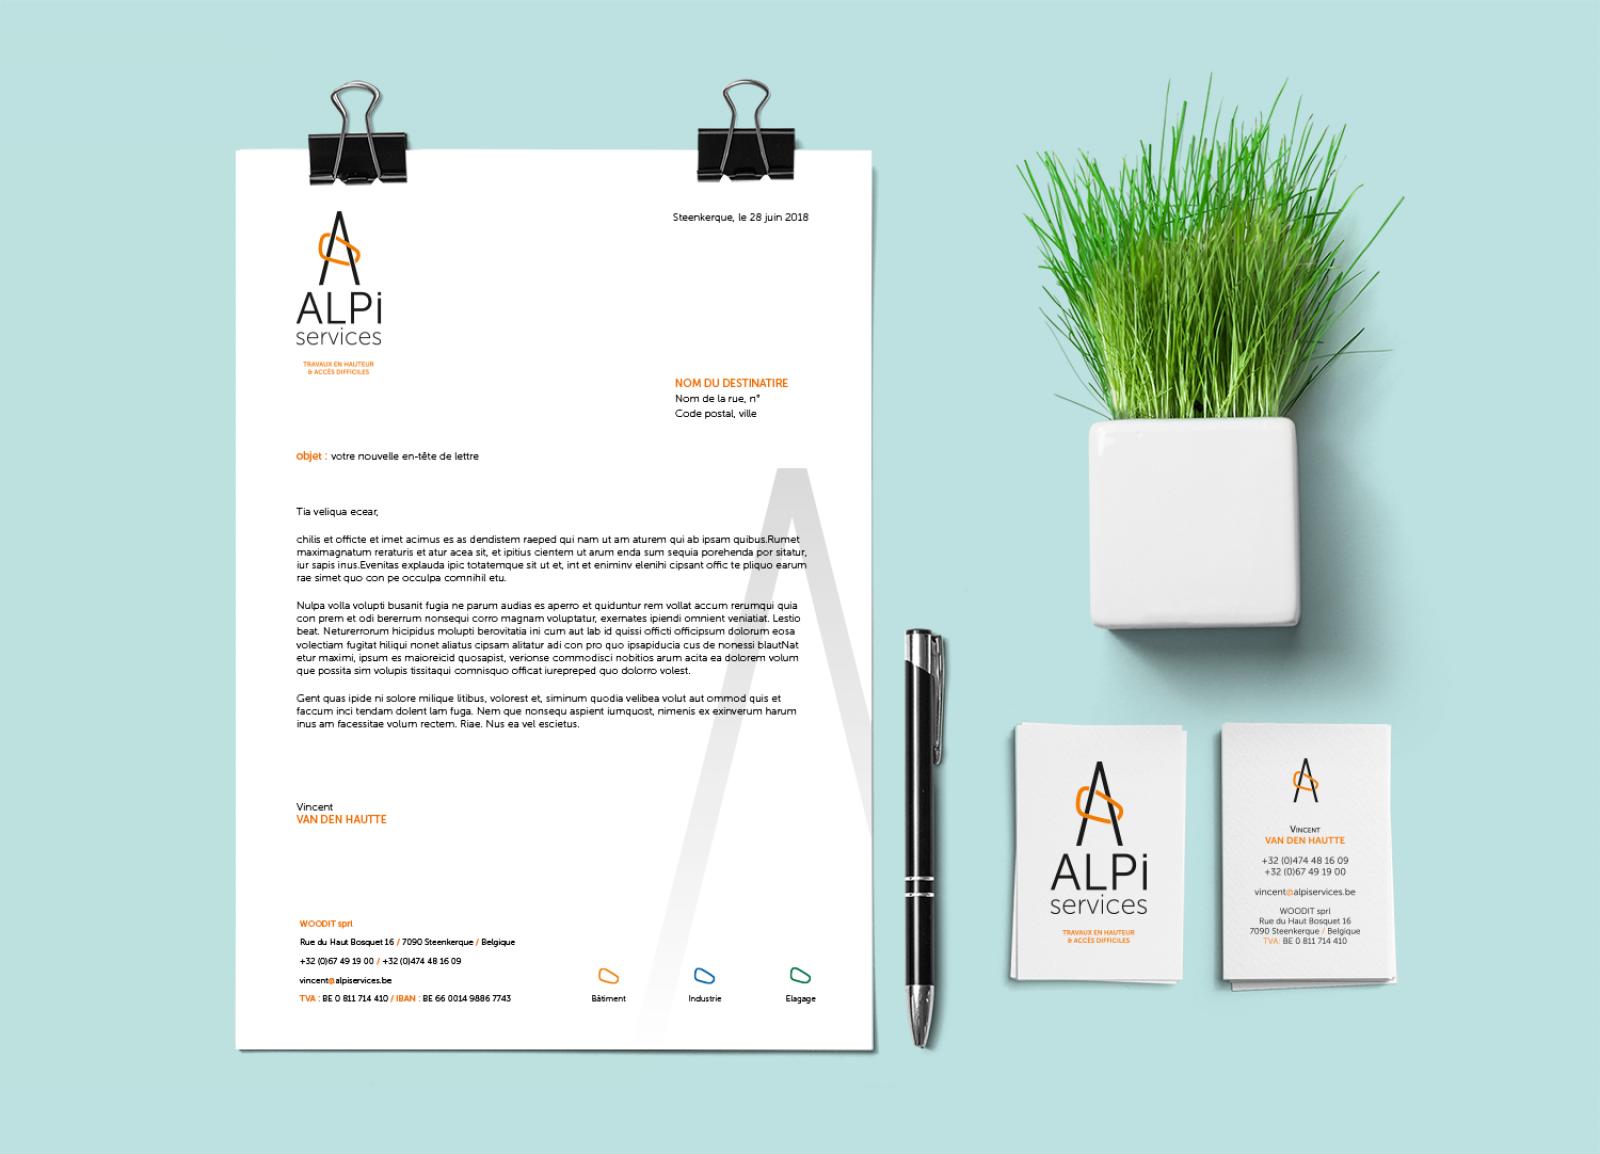 1_Alpi services